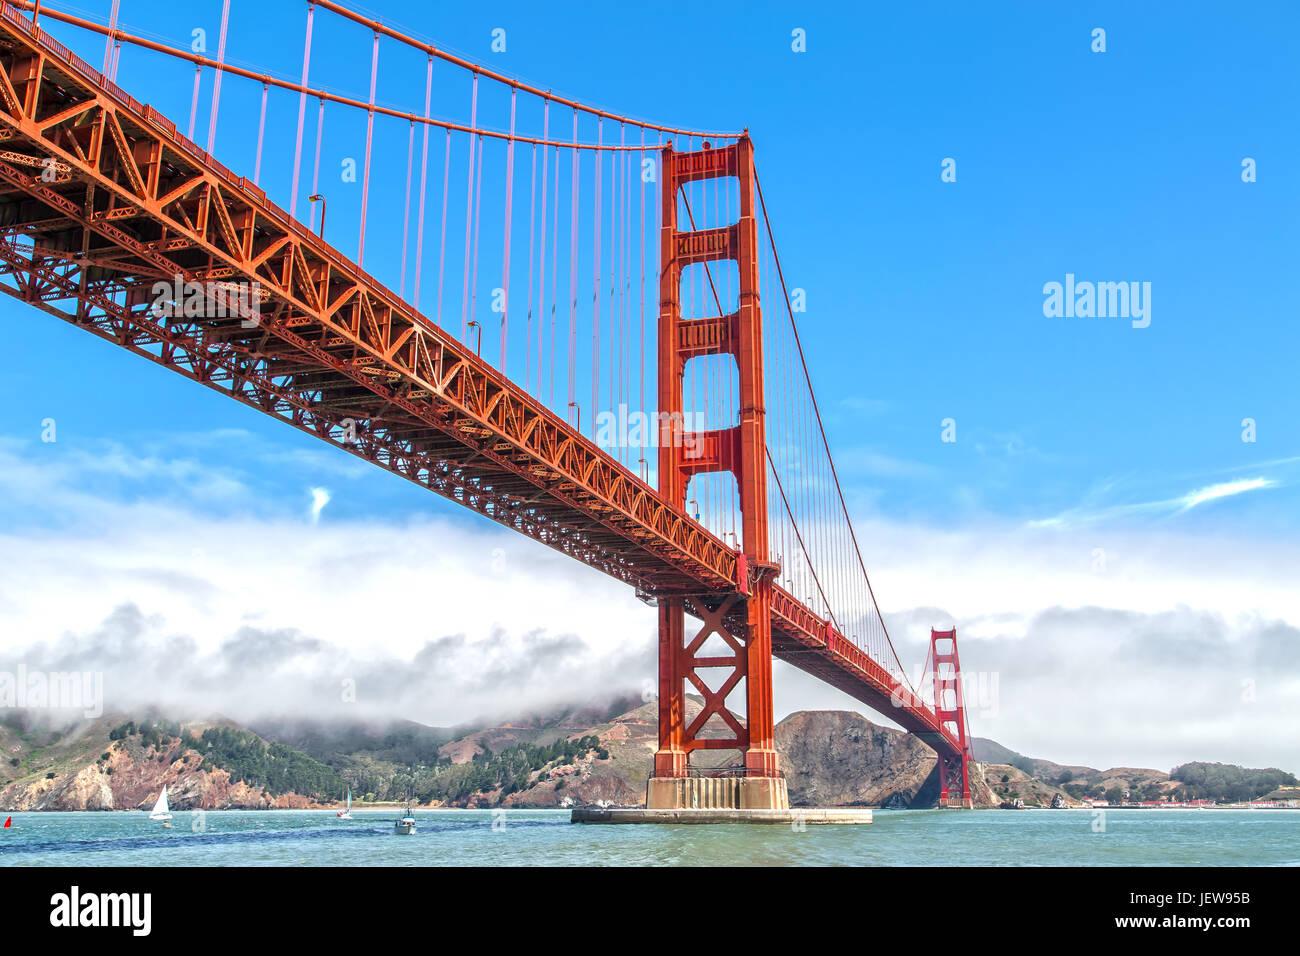 Golden Gate Bridge San Francisco Photo Stock